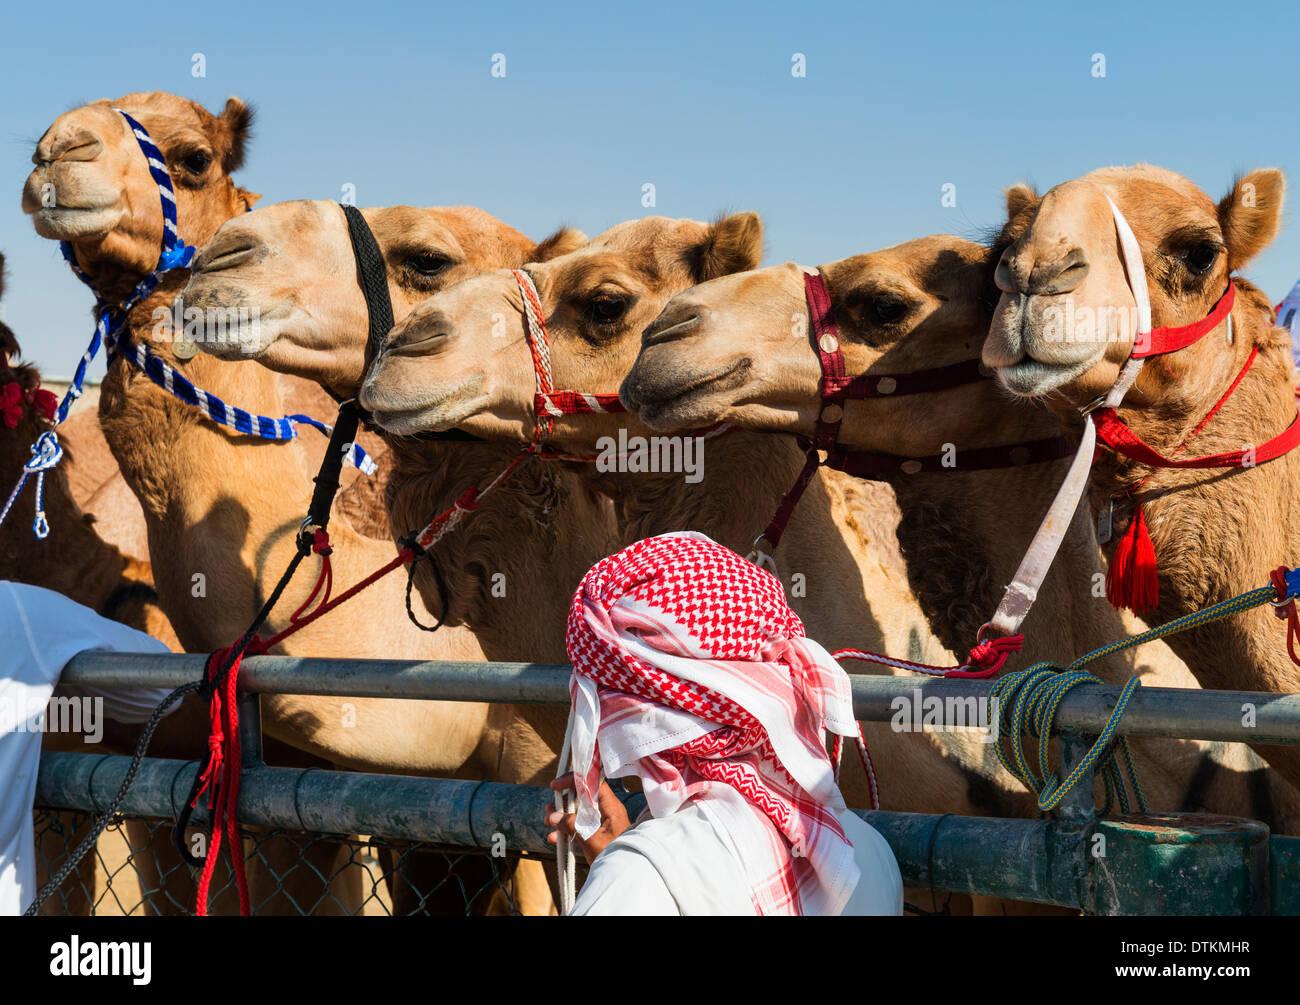 camel racing at Dubai Camel Racing Club at Al Marmoum in Dubai United Arab Emirates - Stock Image